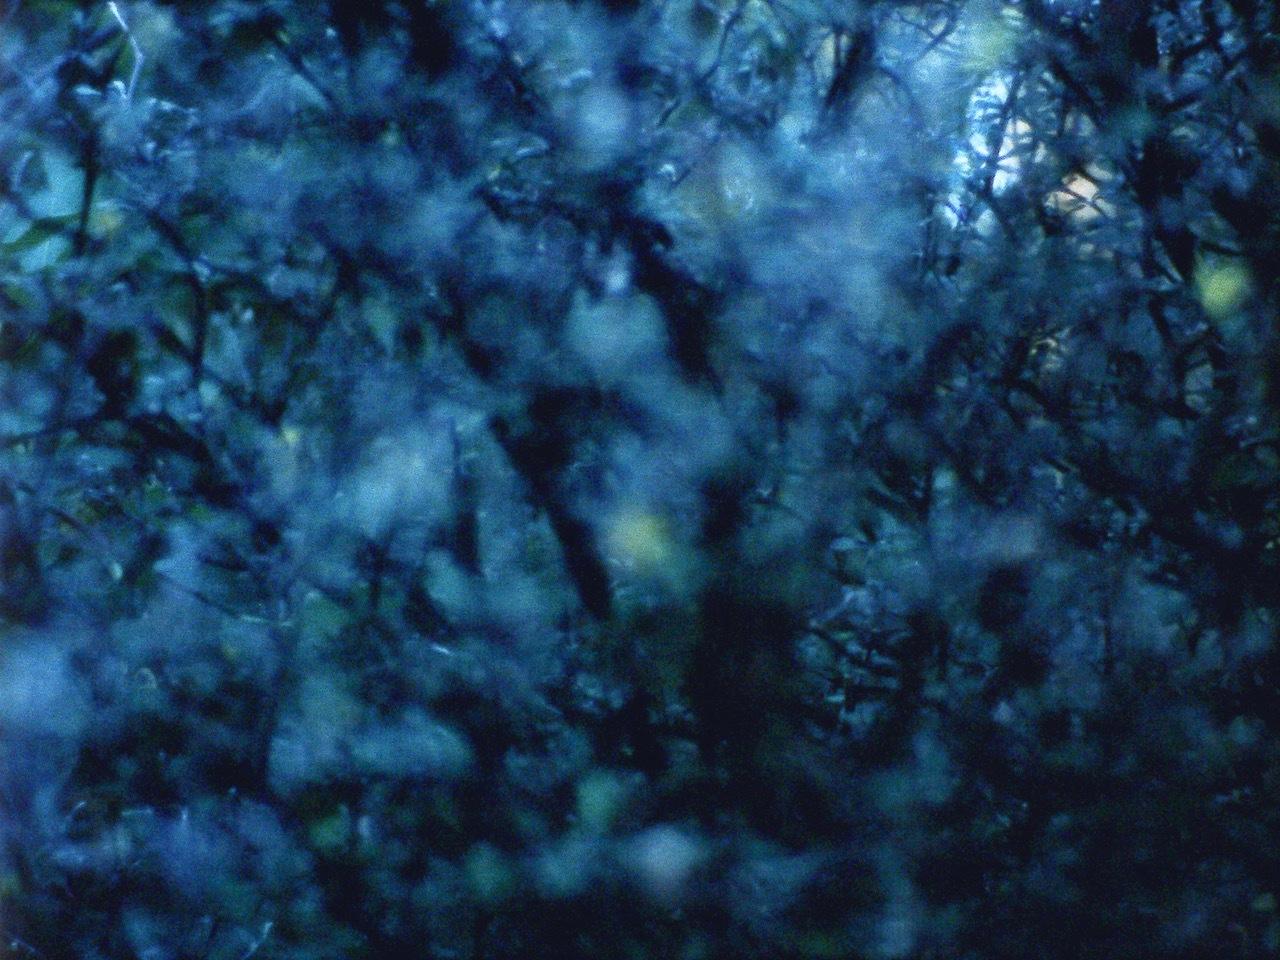 From <i>Monody</i>, the sixth piece of <i>The Arboretum Cycle</i>